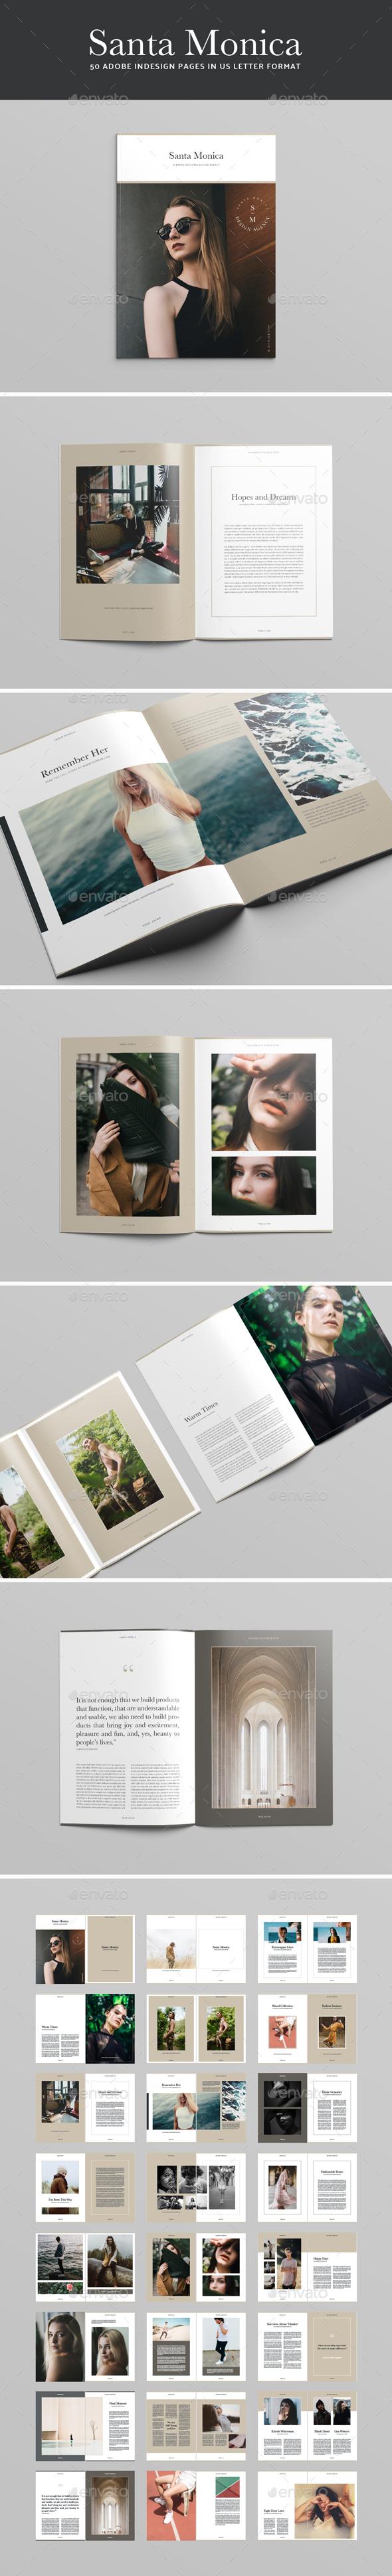 Santa Monica Magazine Template - Magazines Print Templates